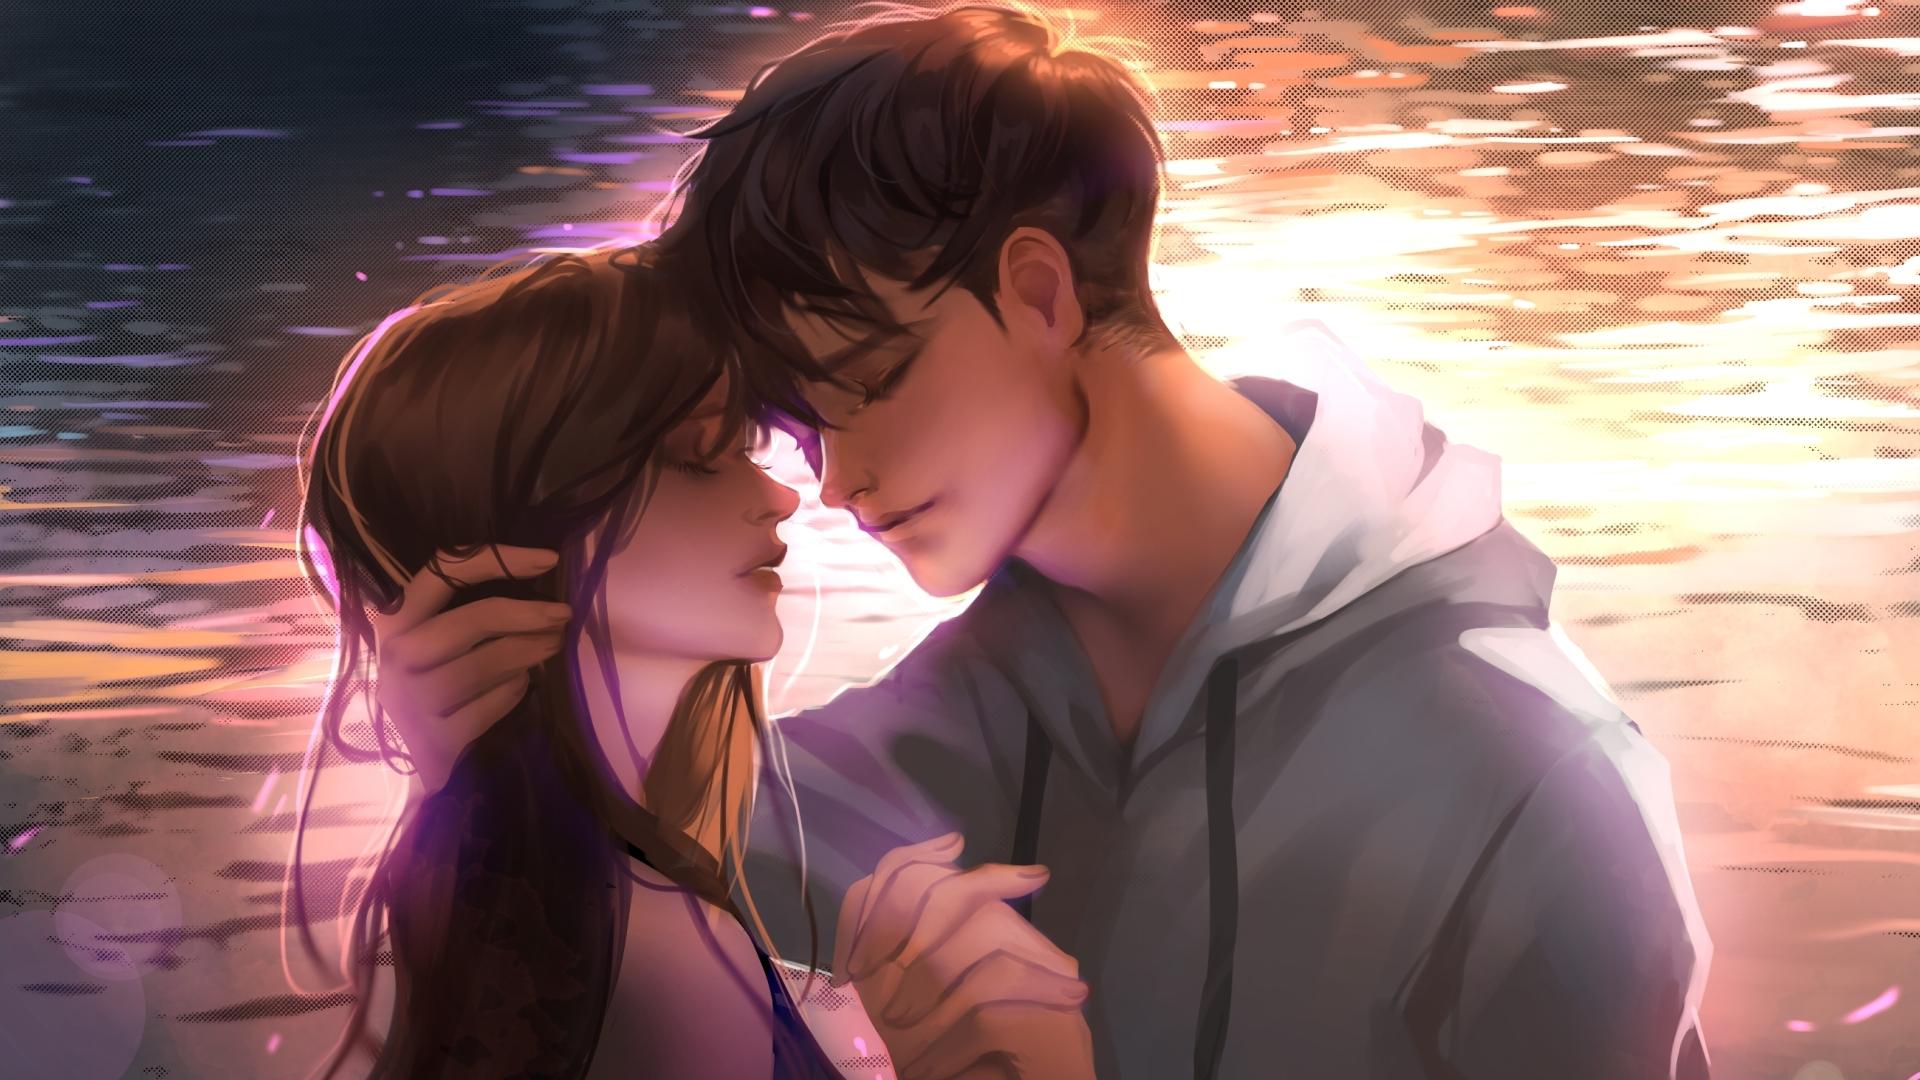 1920x1080 Anime Romantic Couple 2019 1080p Laptop Full Hd